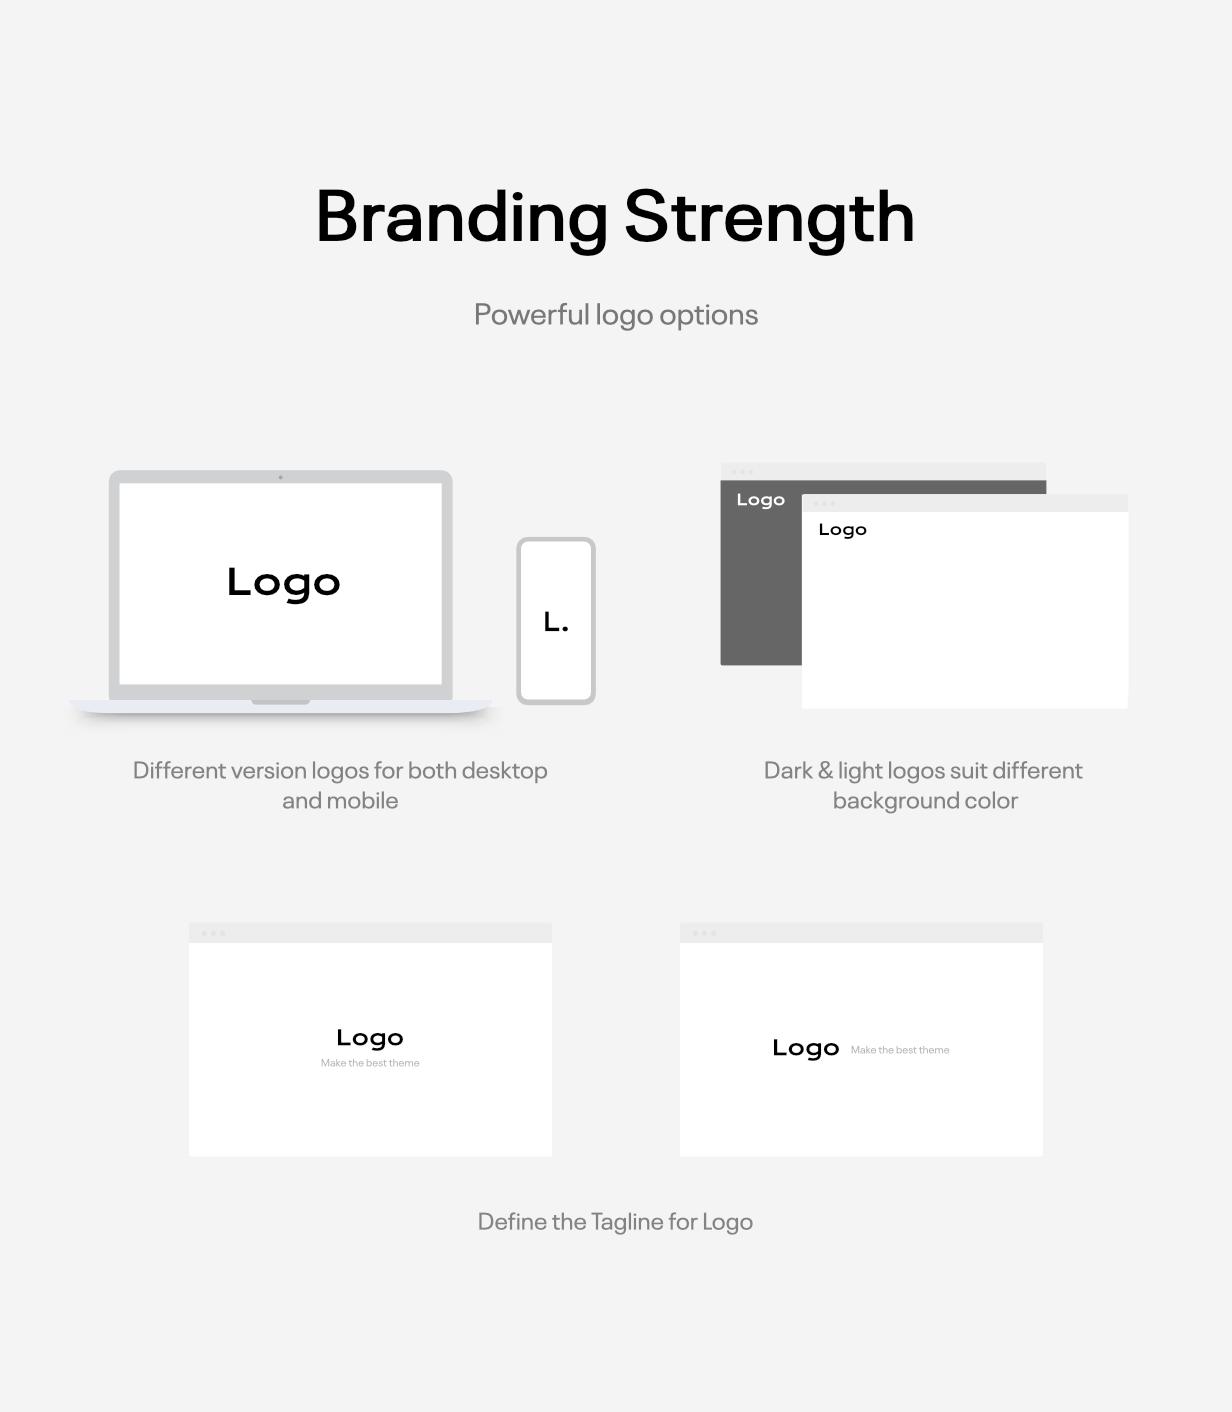 Logo-options